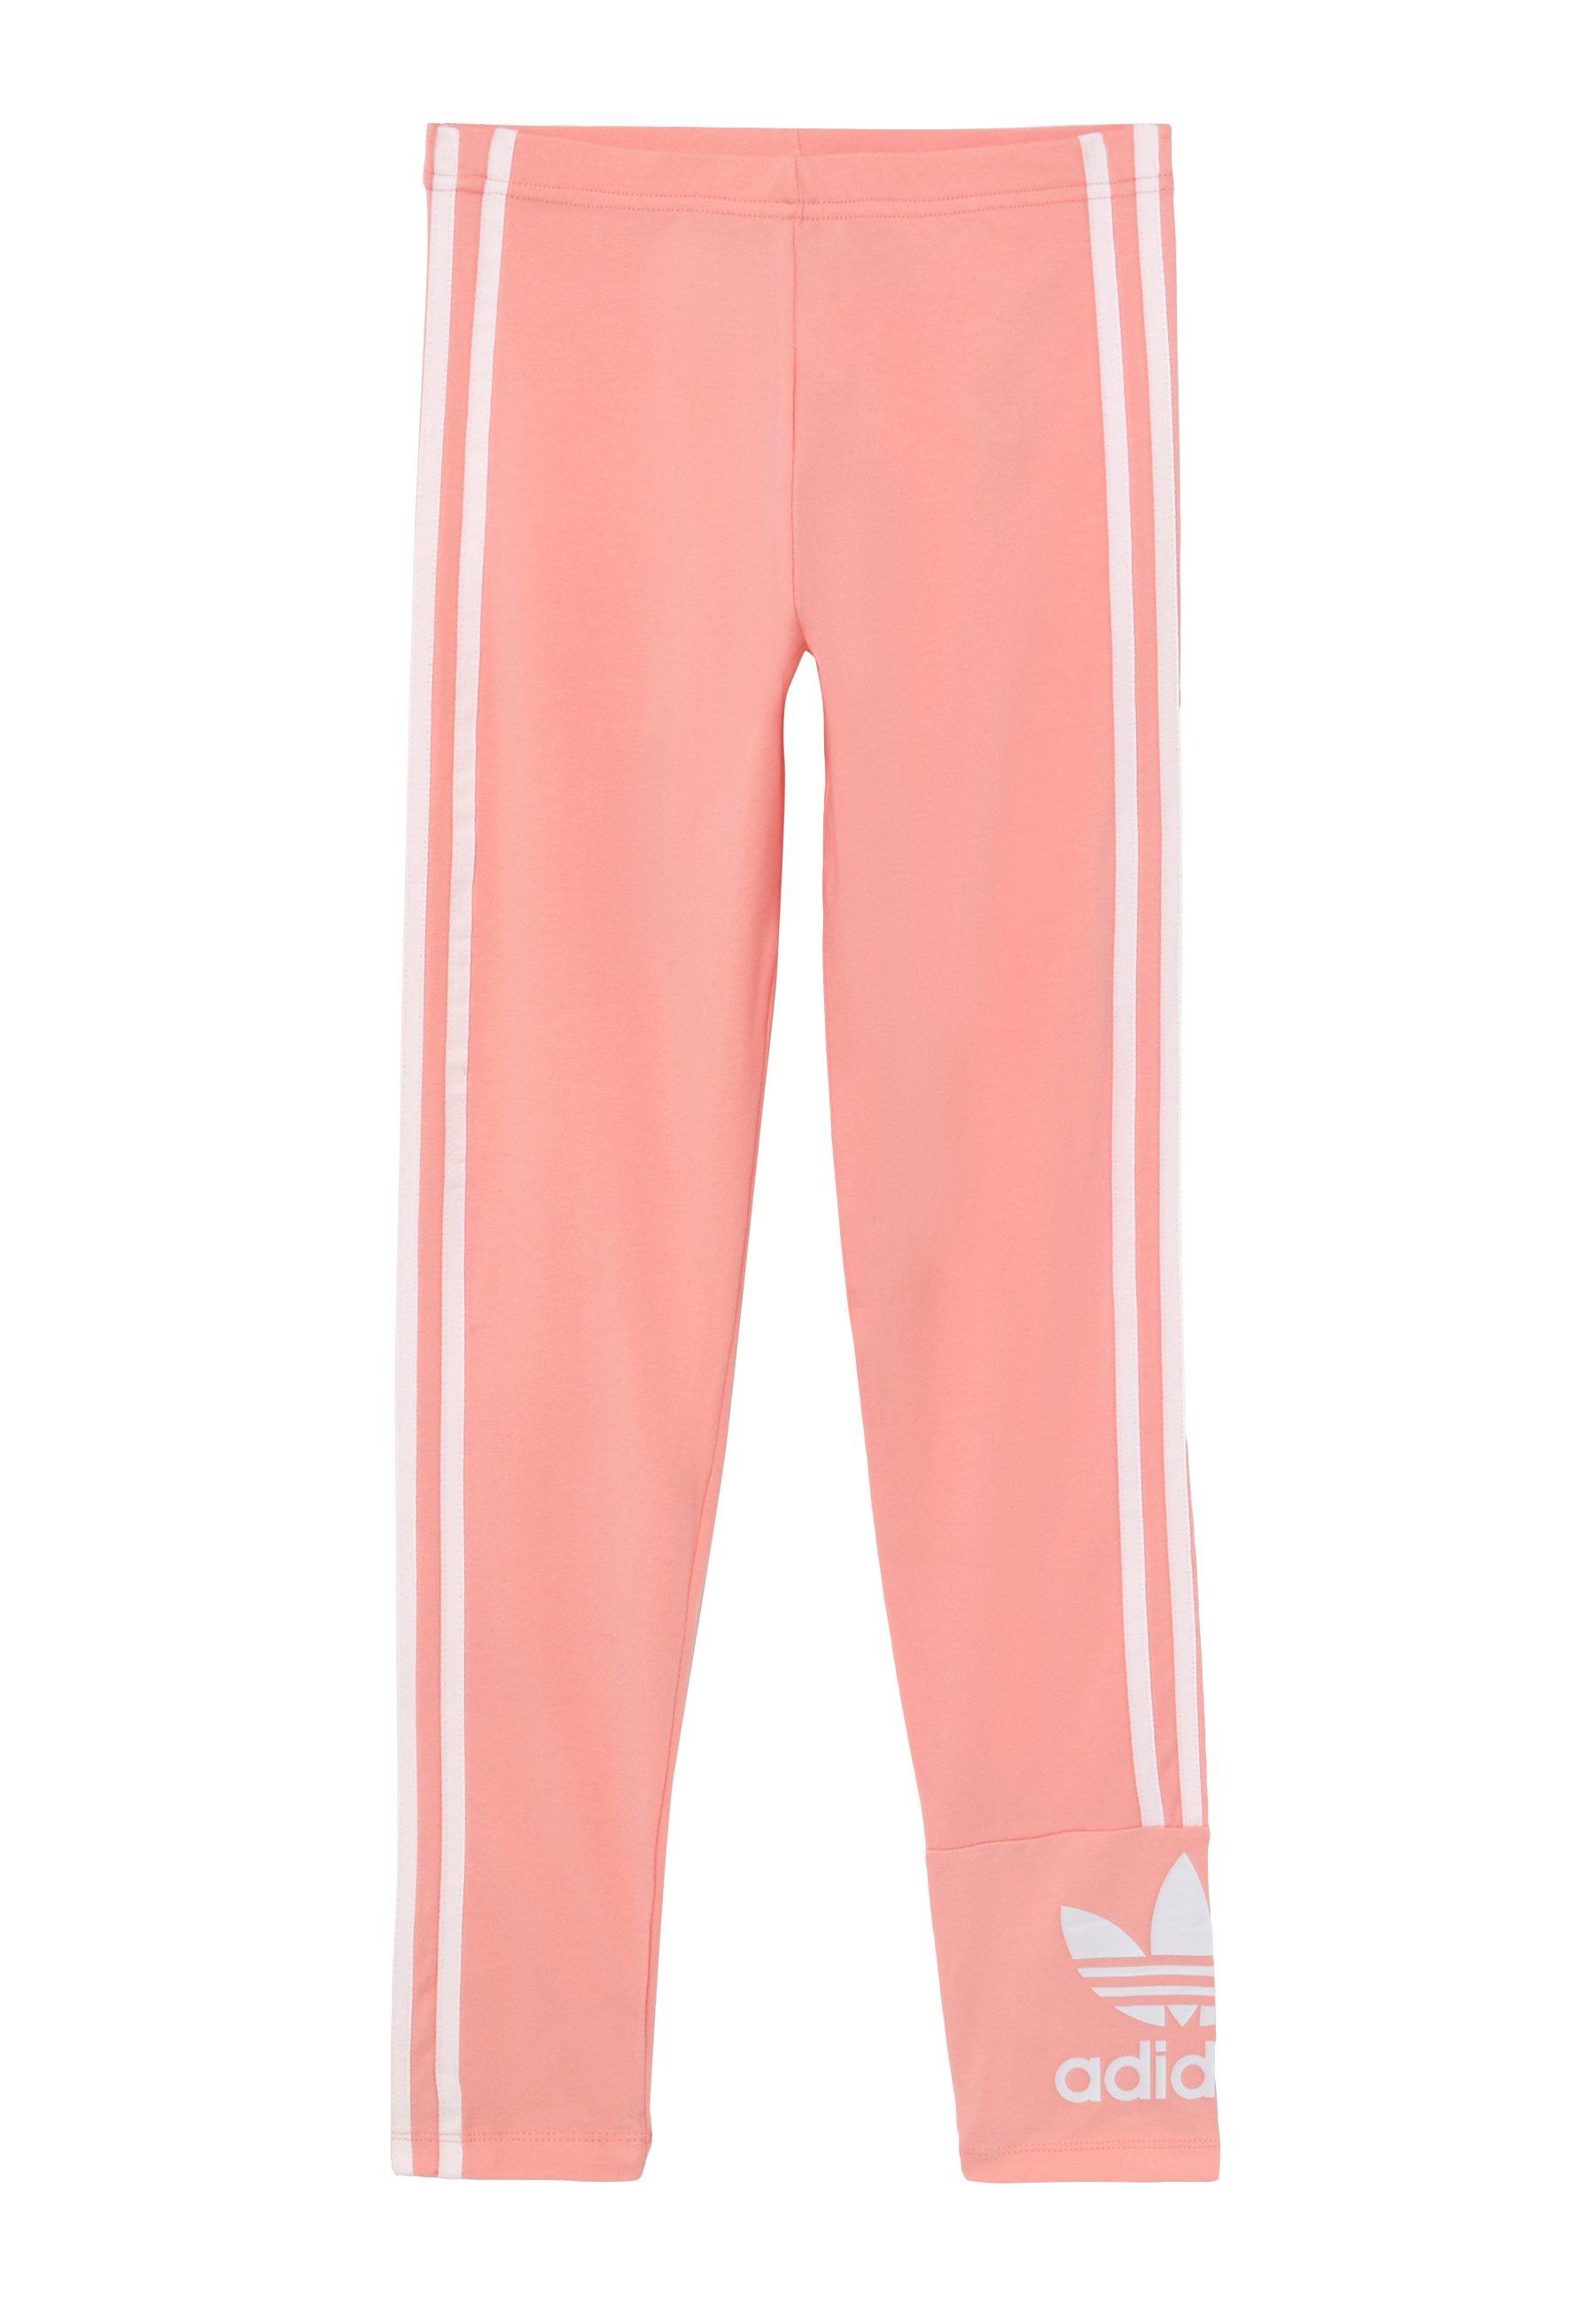 Adidas Originals Lock Up Tights - Leggings Trousers Pink/white